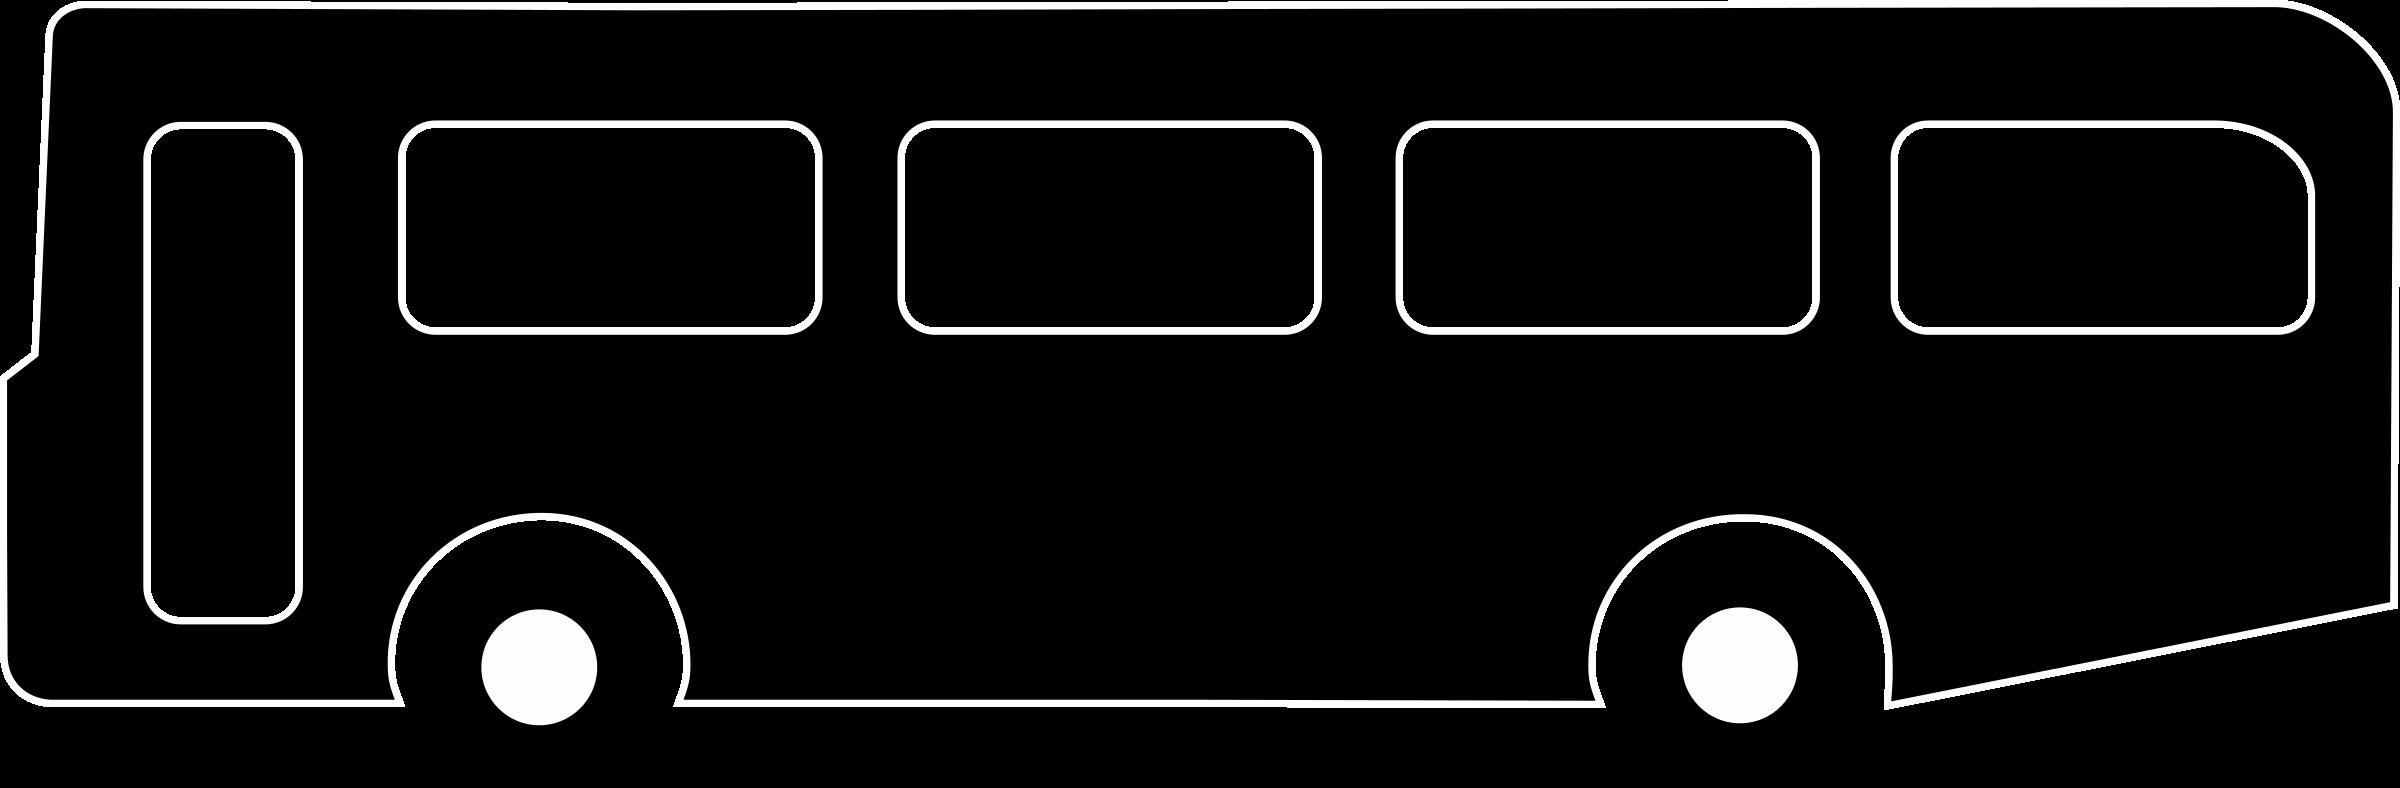 Bus clipart silhouette Black symbol Bus Bus black